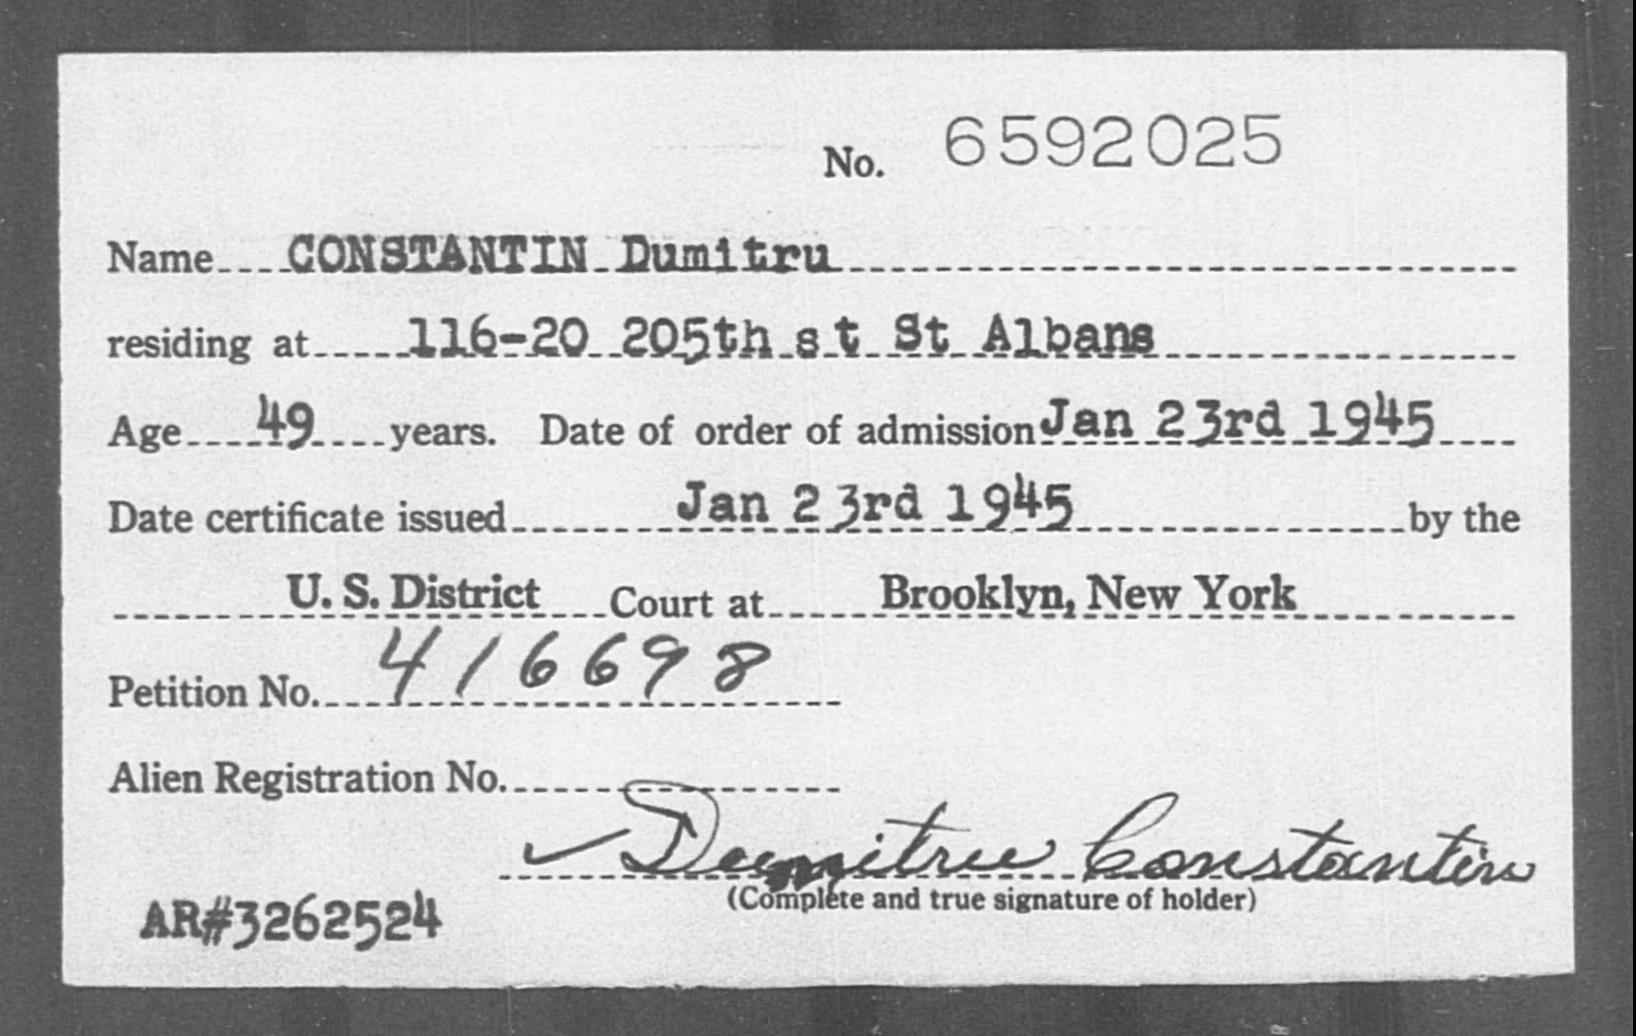 CONSTANTIN Dumitru - Born: [BLANK], Naturalized: 1945